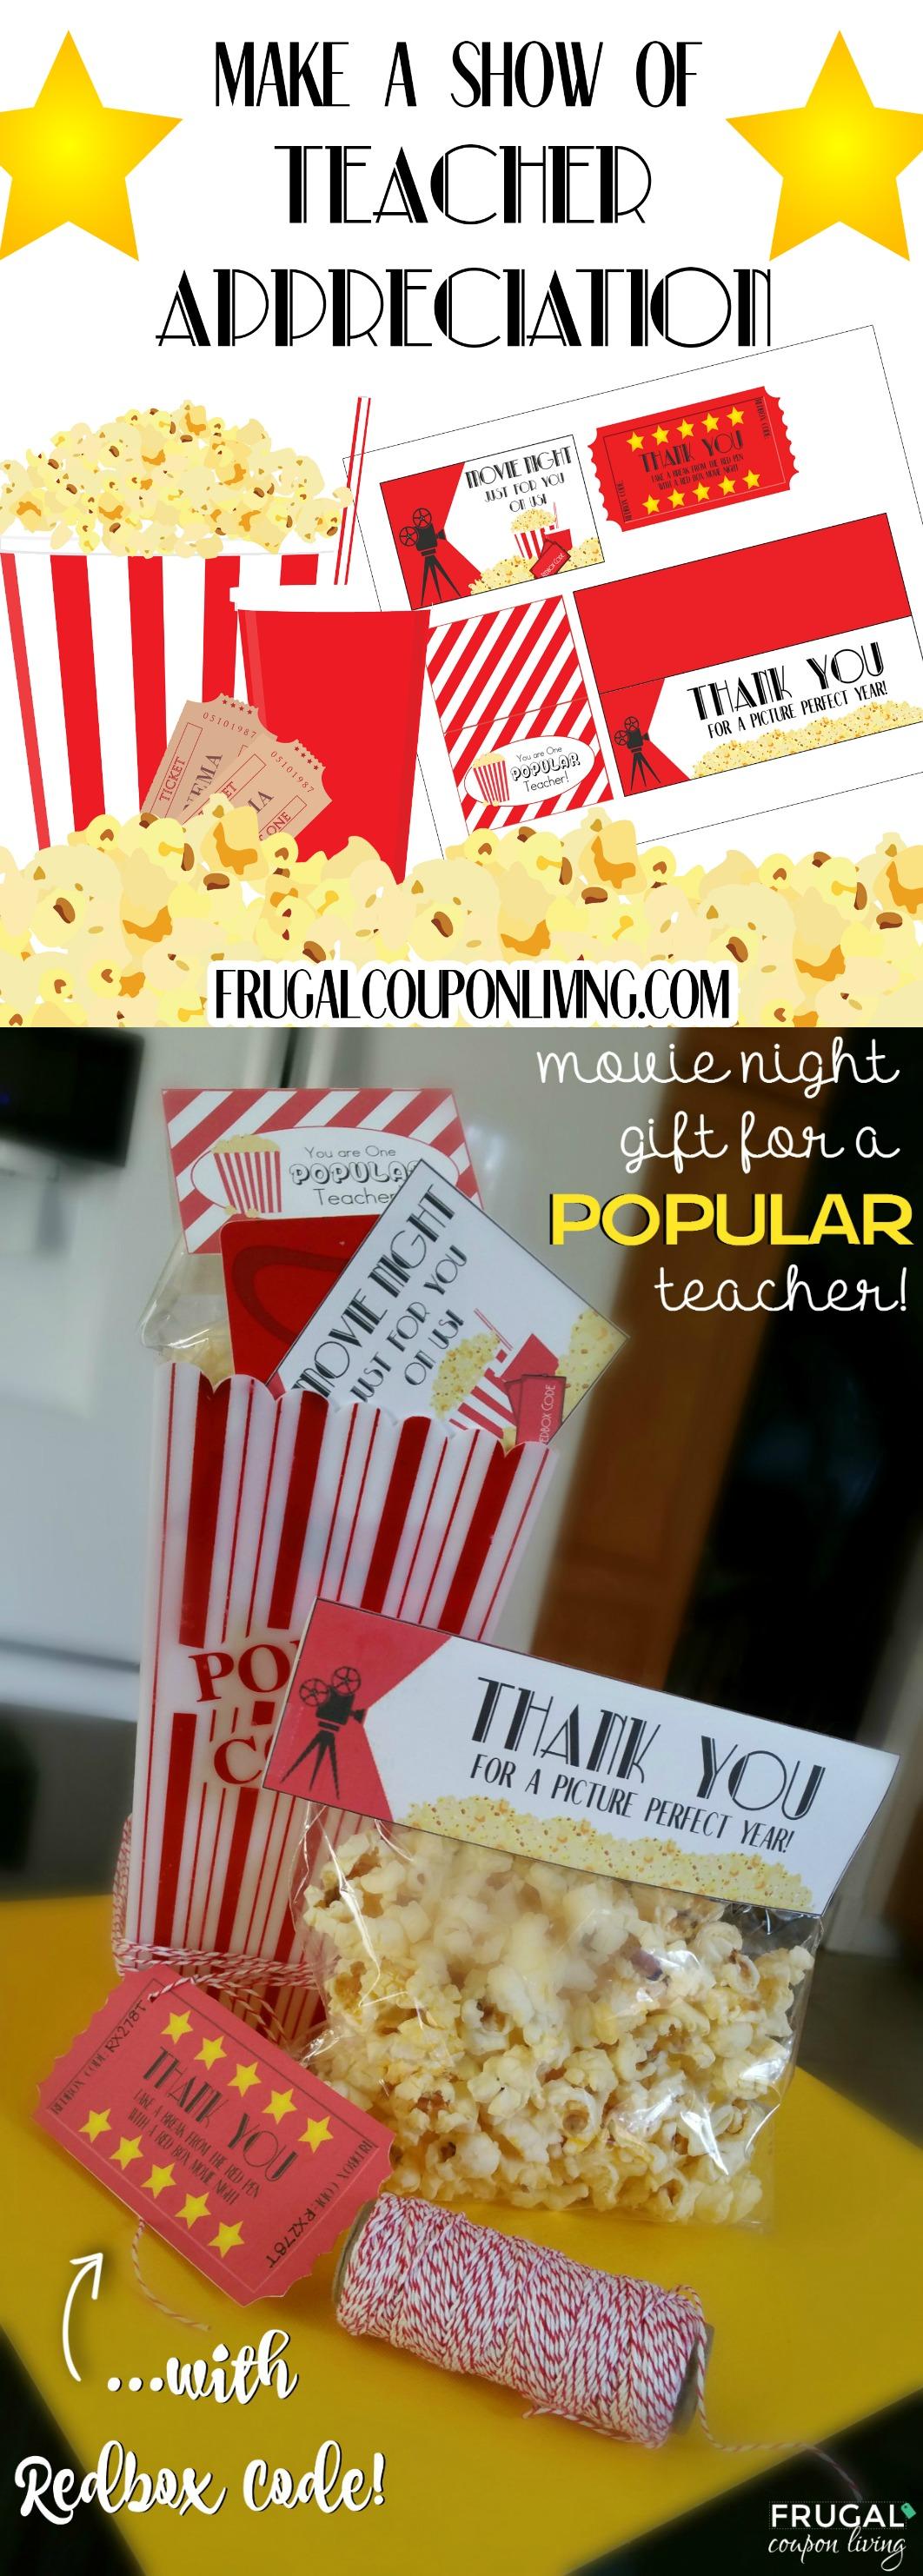 popular-teacher-appreciation-collage-frugal-coupon-living